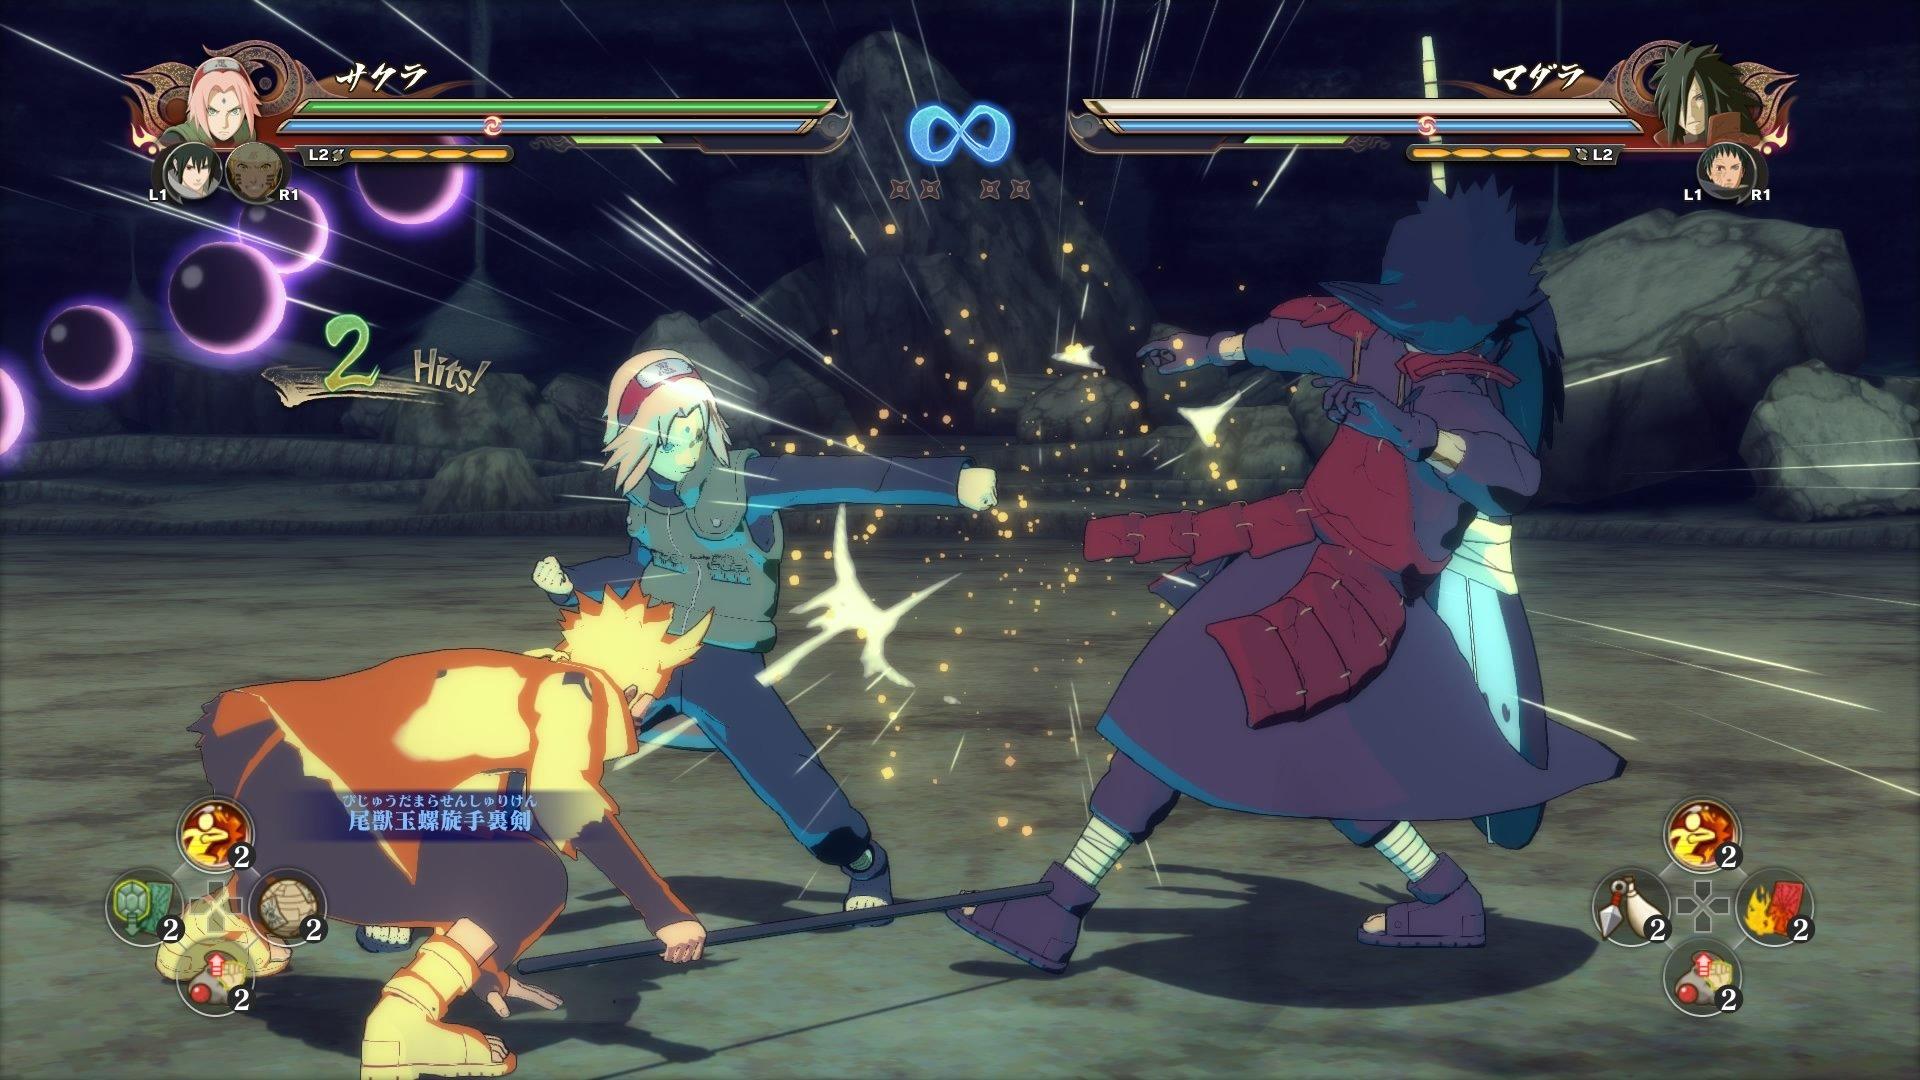 010_1437139172 Naruto Shippuden Ultimate Ninja Storm 4